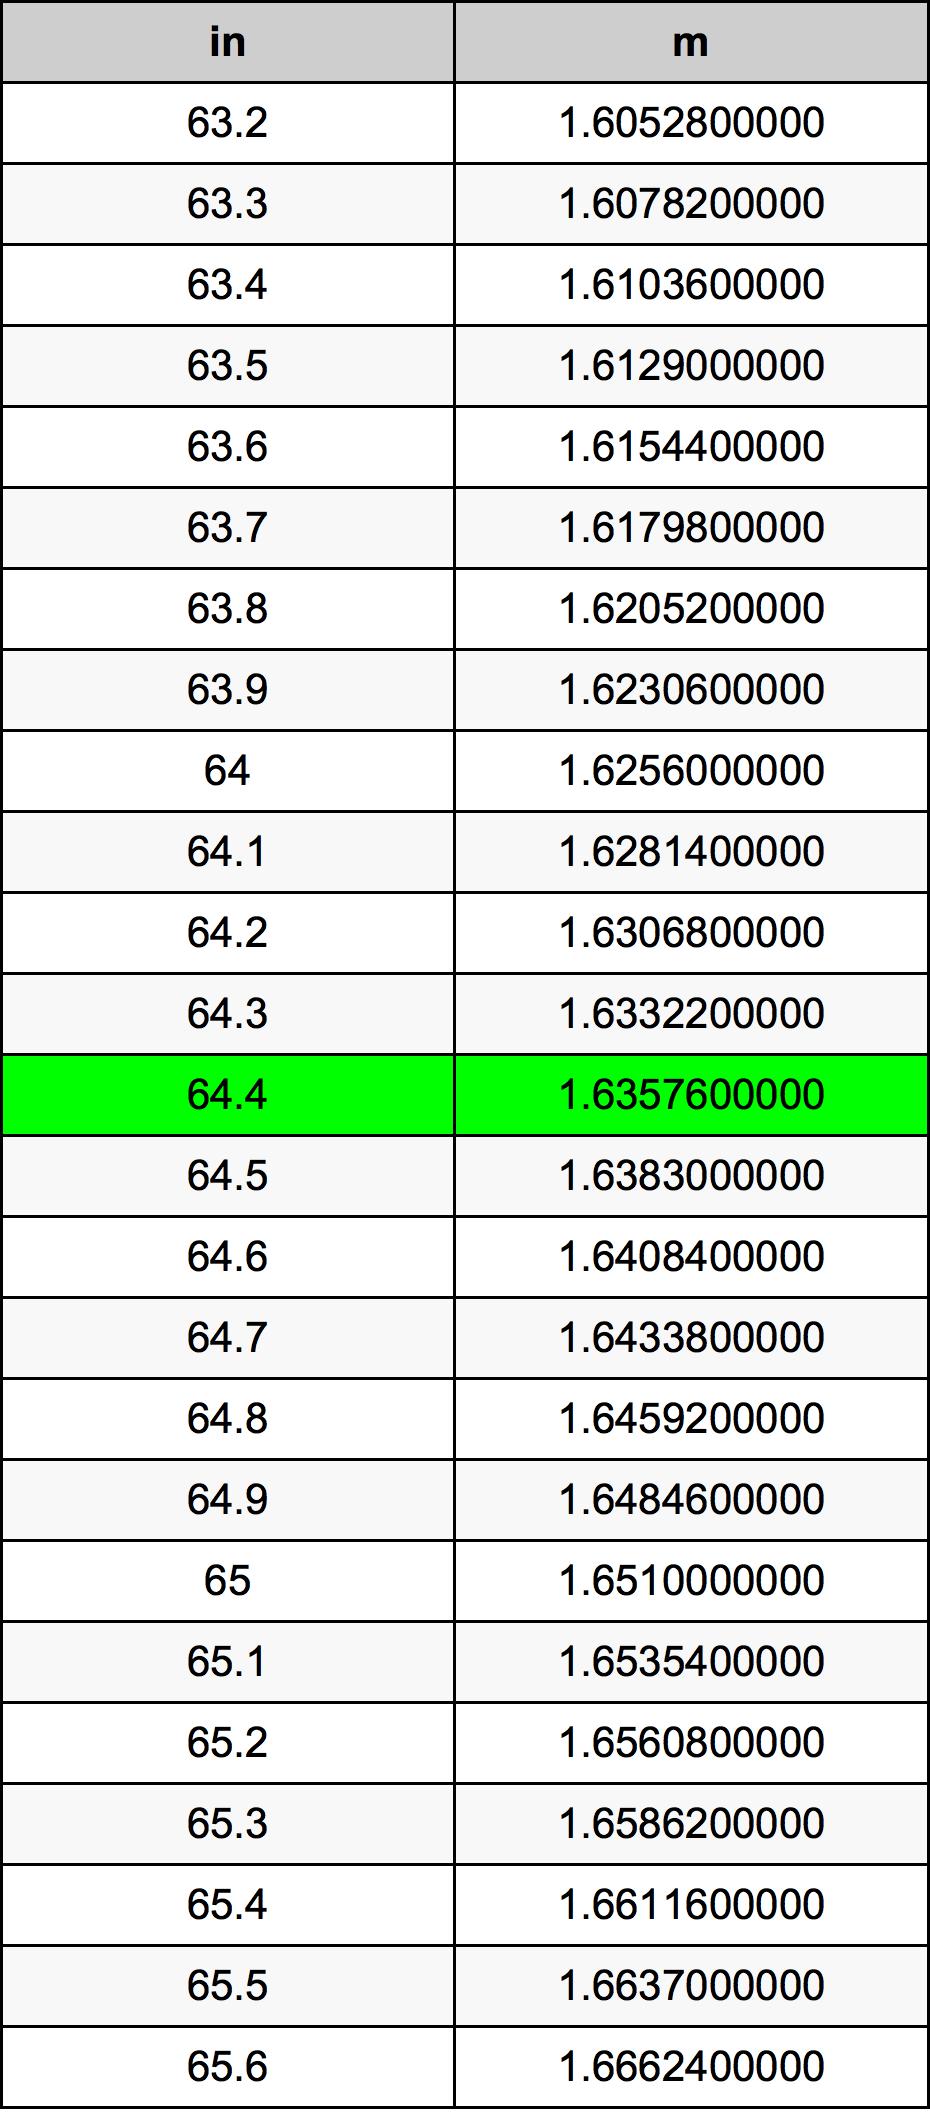 64.4 Inch konverteringstabell